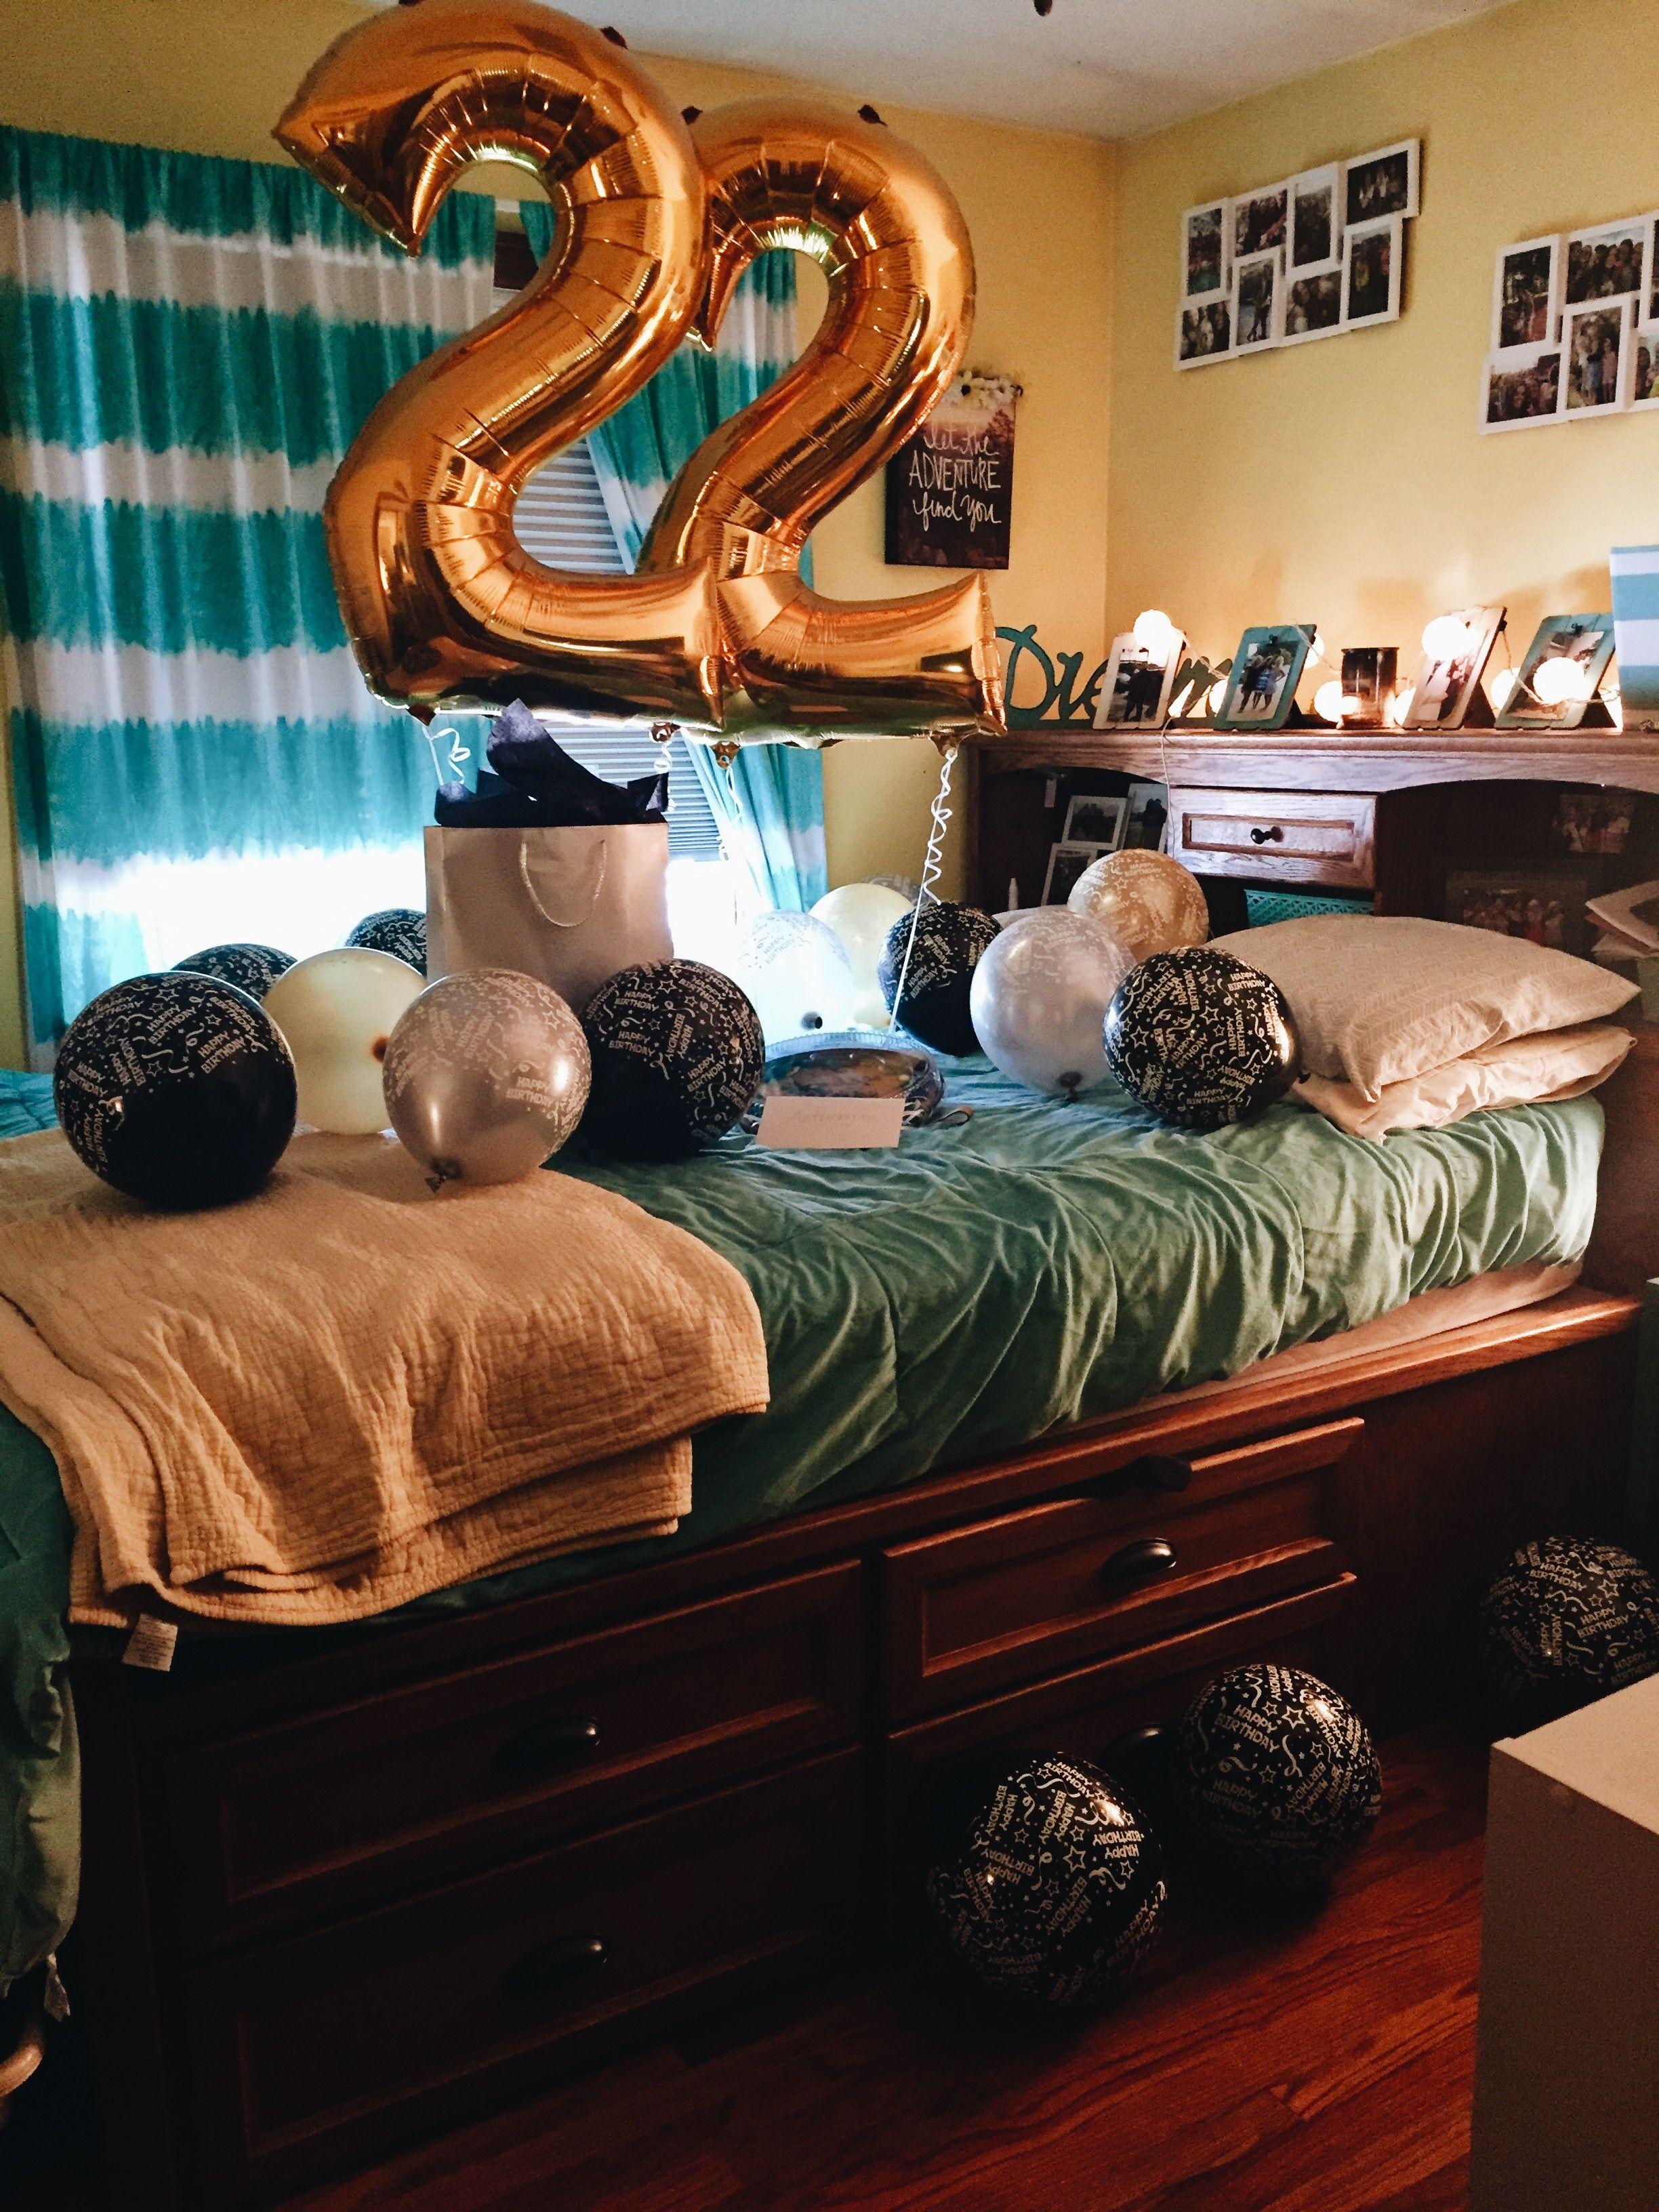 Boyfriend birthday idea